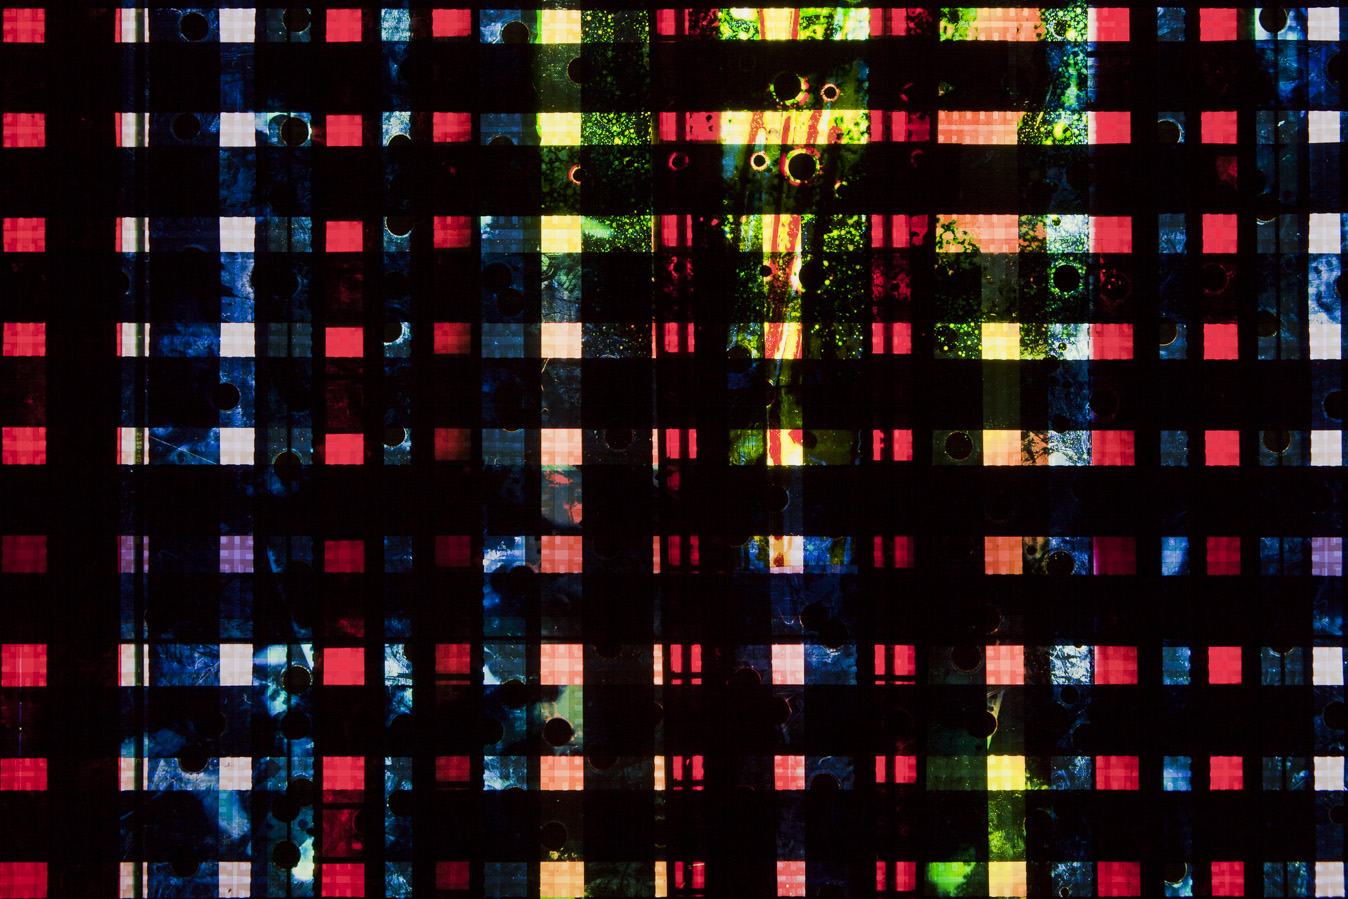 Drill Blue no.2. 35mm Celluloid Film, Fluorescent Lights, Custom Lightbox. 30x30x6. Richard Kerr. 2016. (Detail).